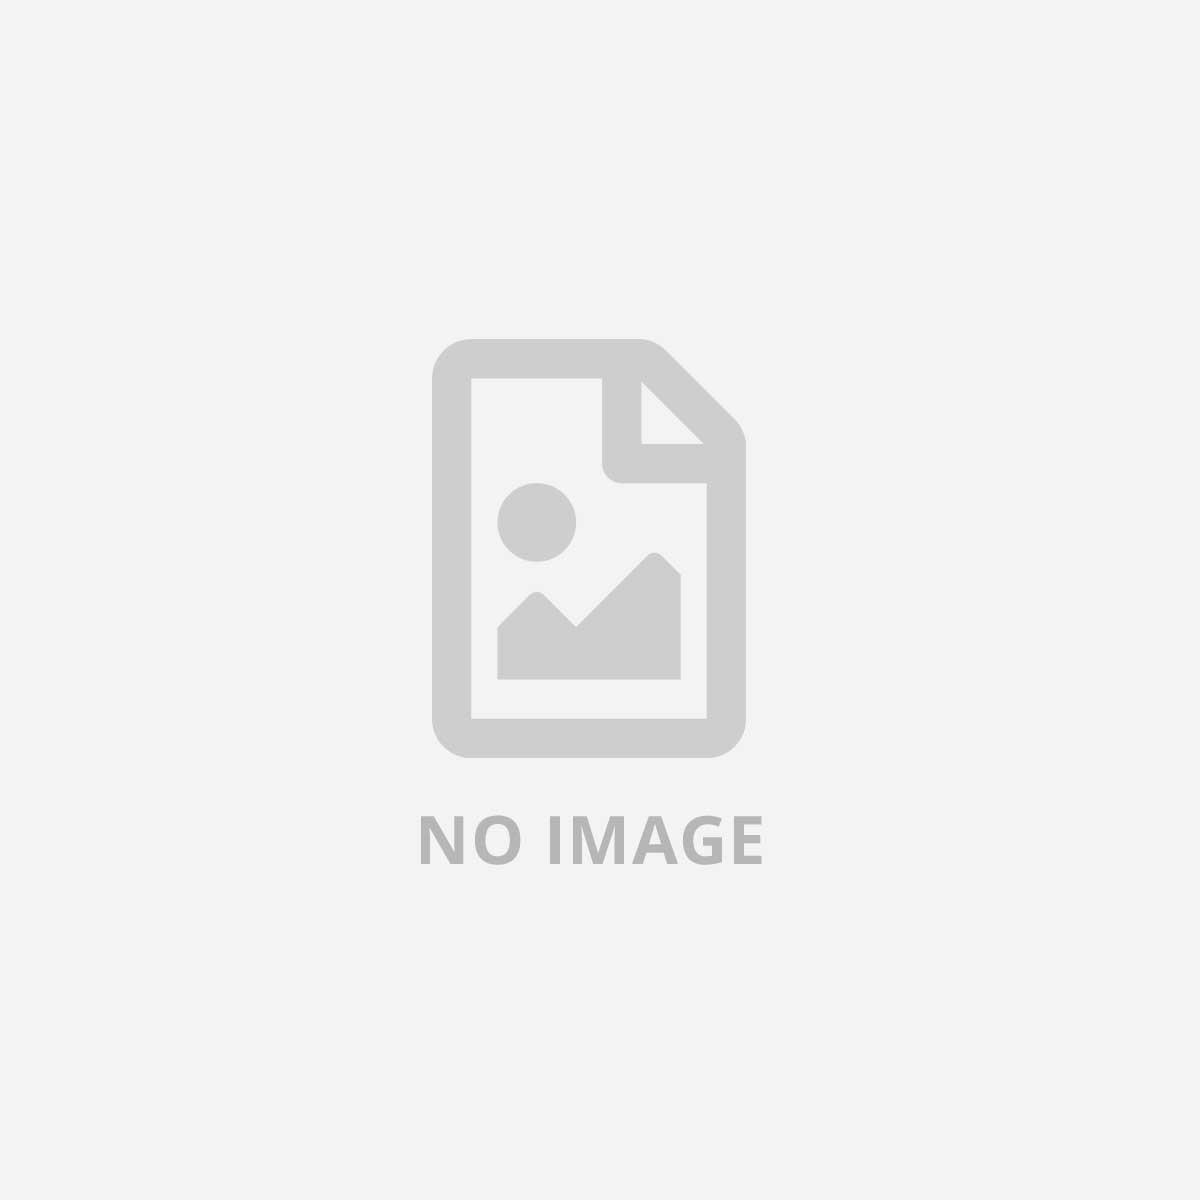 VERBATIM HD USB 3.0- 1TB -2.5 SMARTDISK